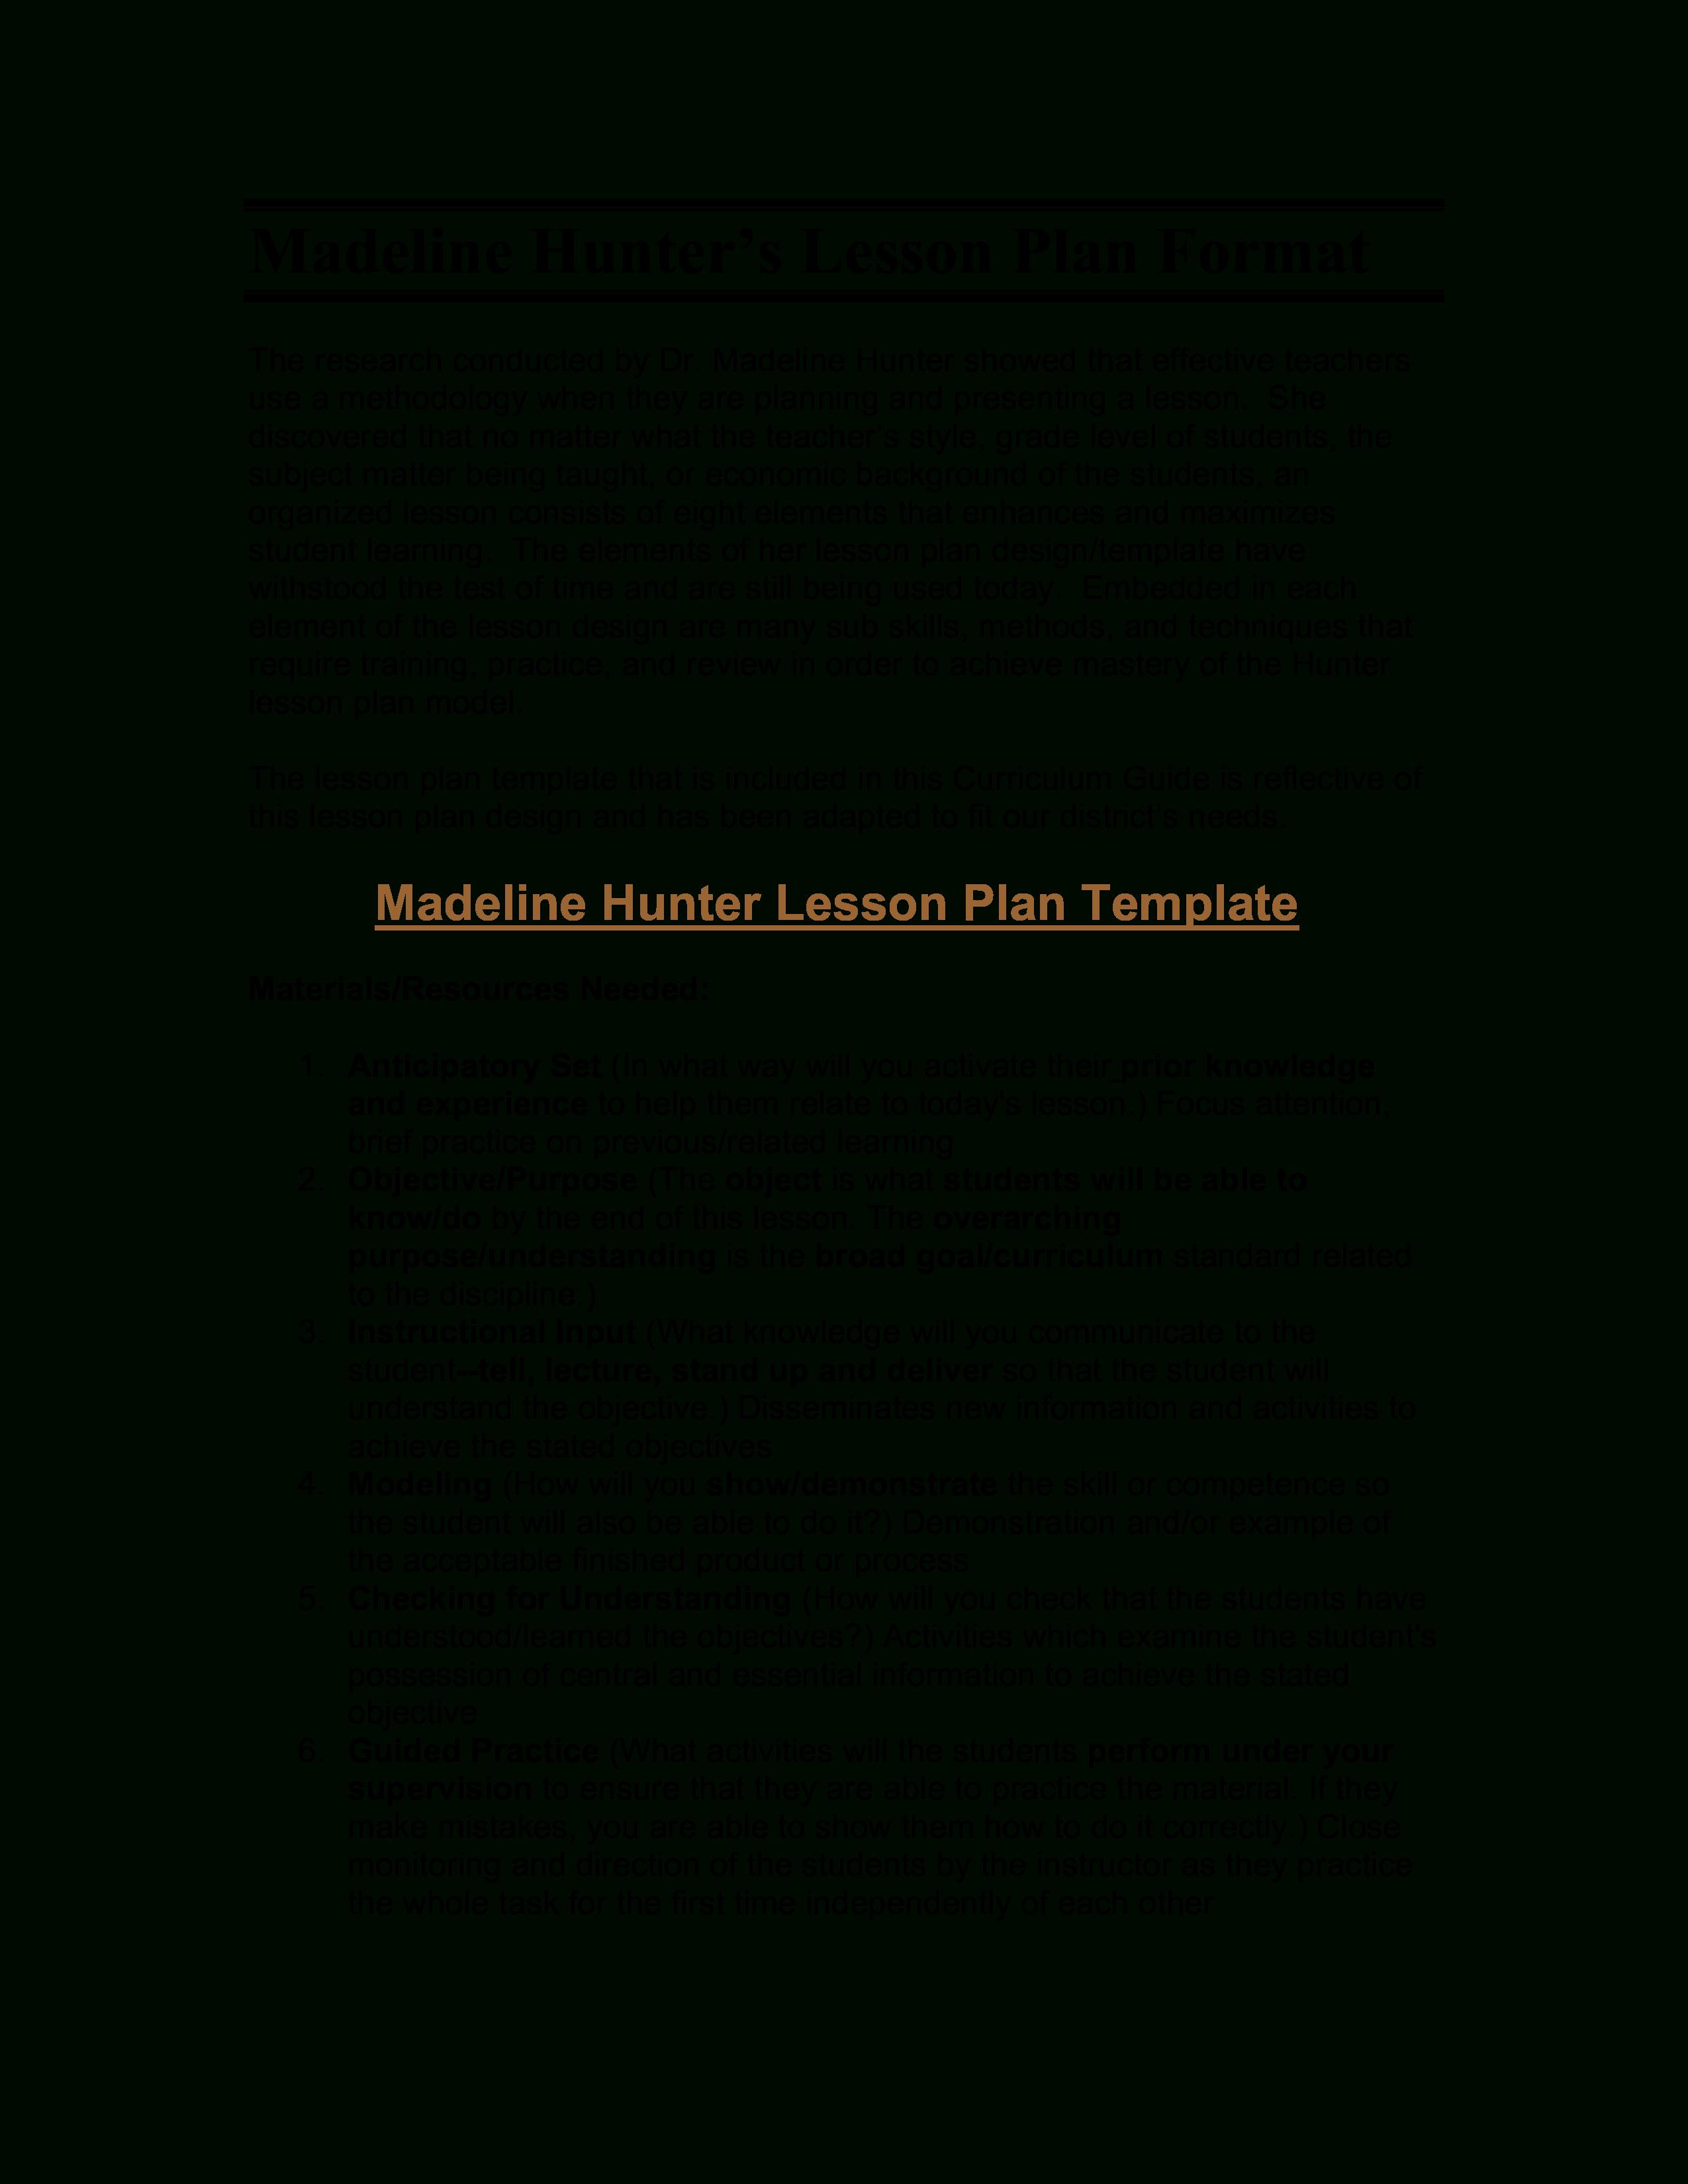 Microsoft Word  Madeline Hunter's Lesson Plan Format  Madeline In Madeline Hunter Lesson Plan Template Word